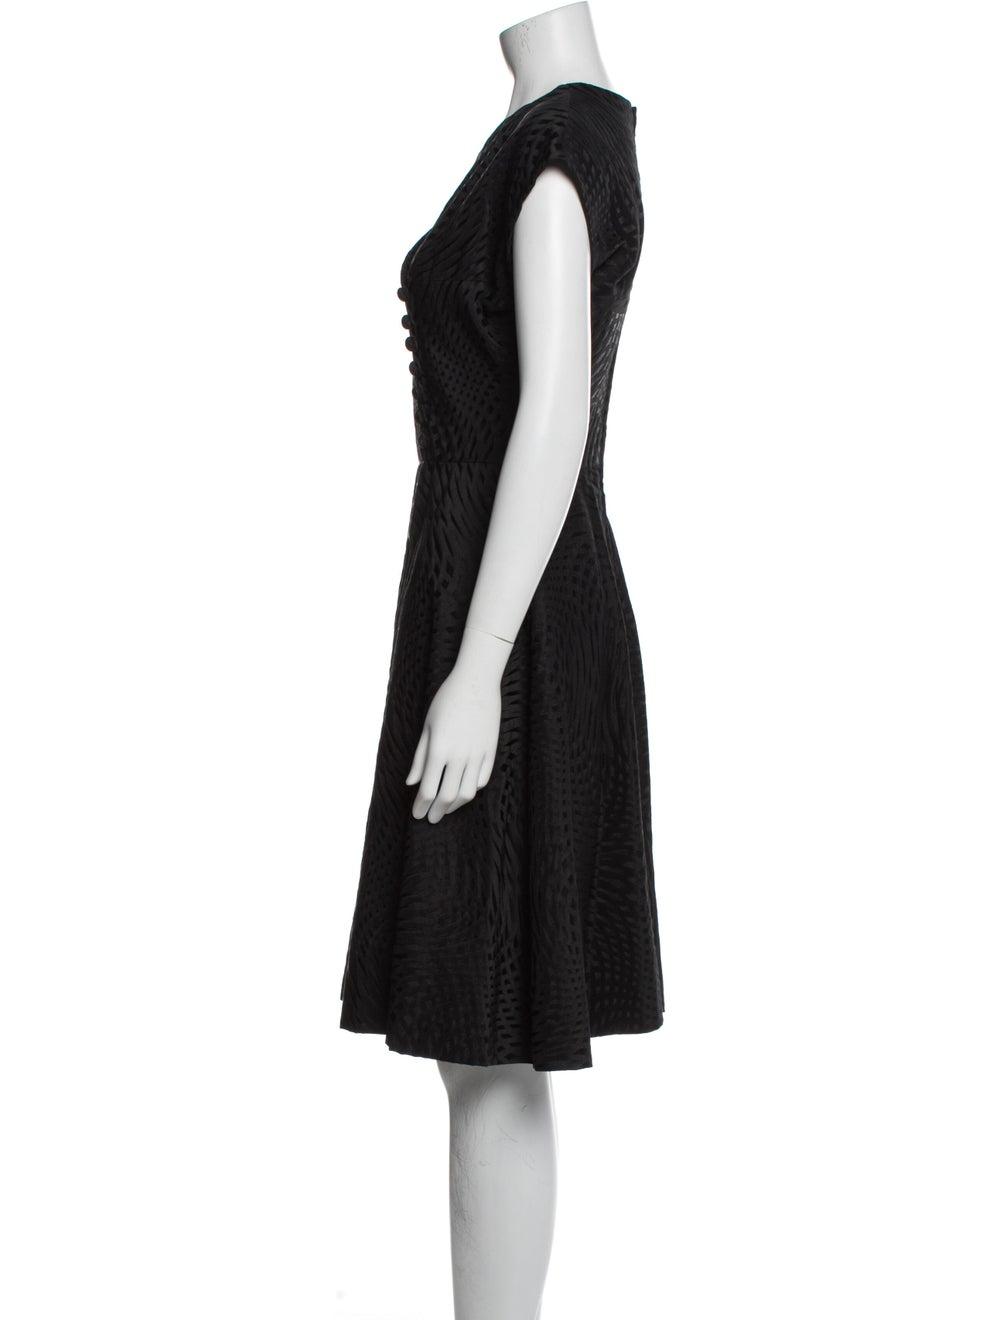 Pauline Trigere V-Neck Knee-Length Dress Black - image 2